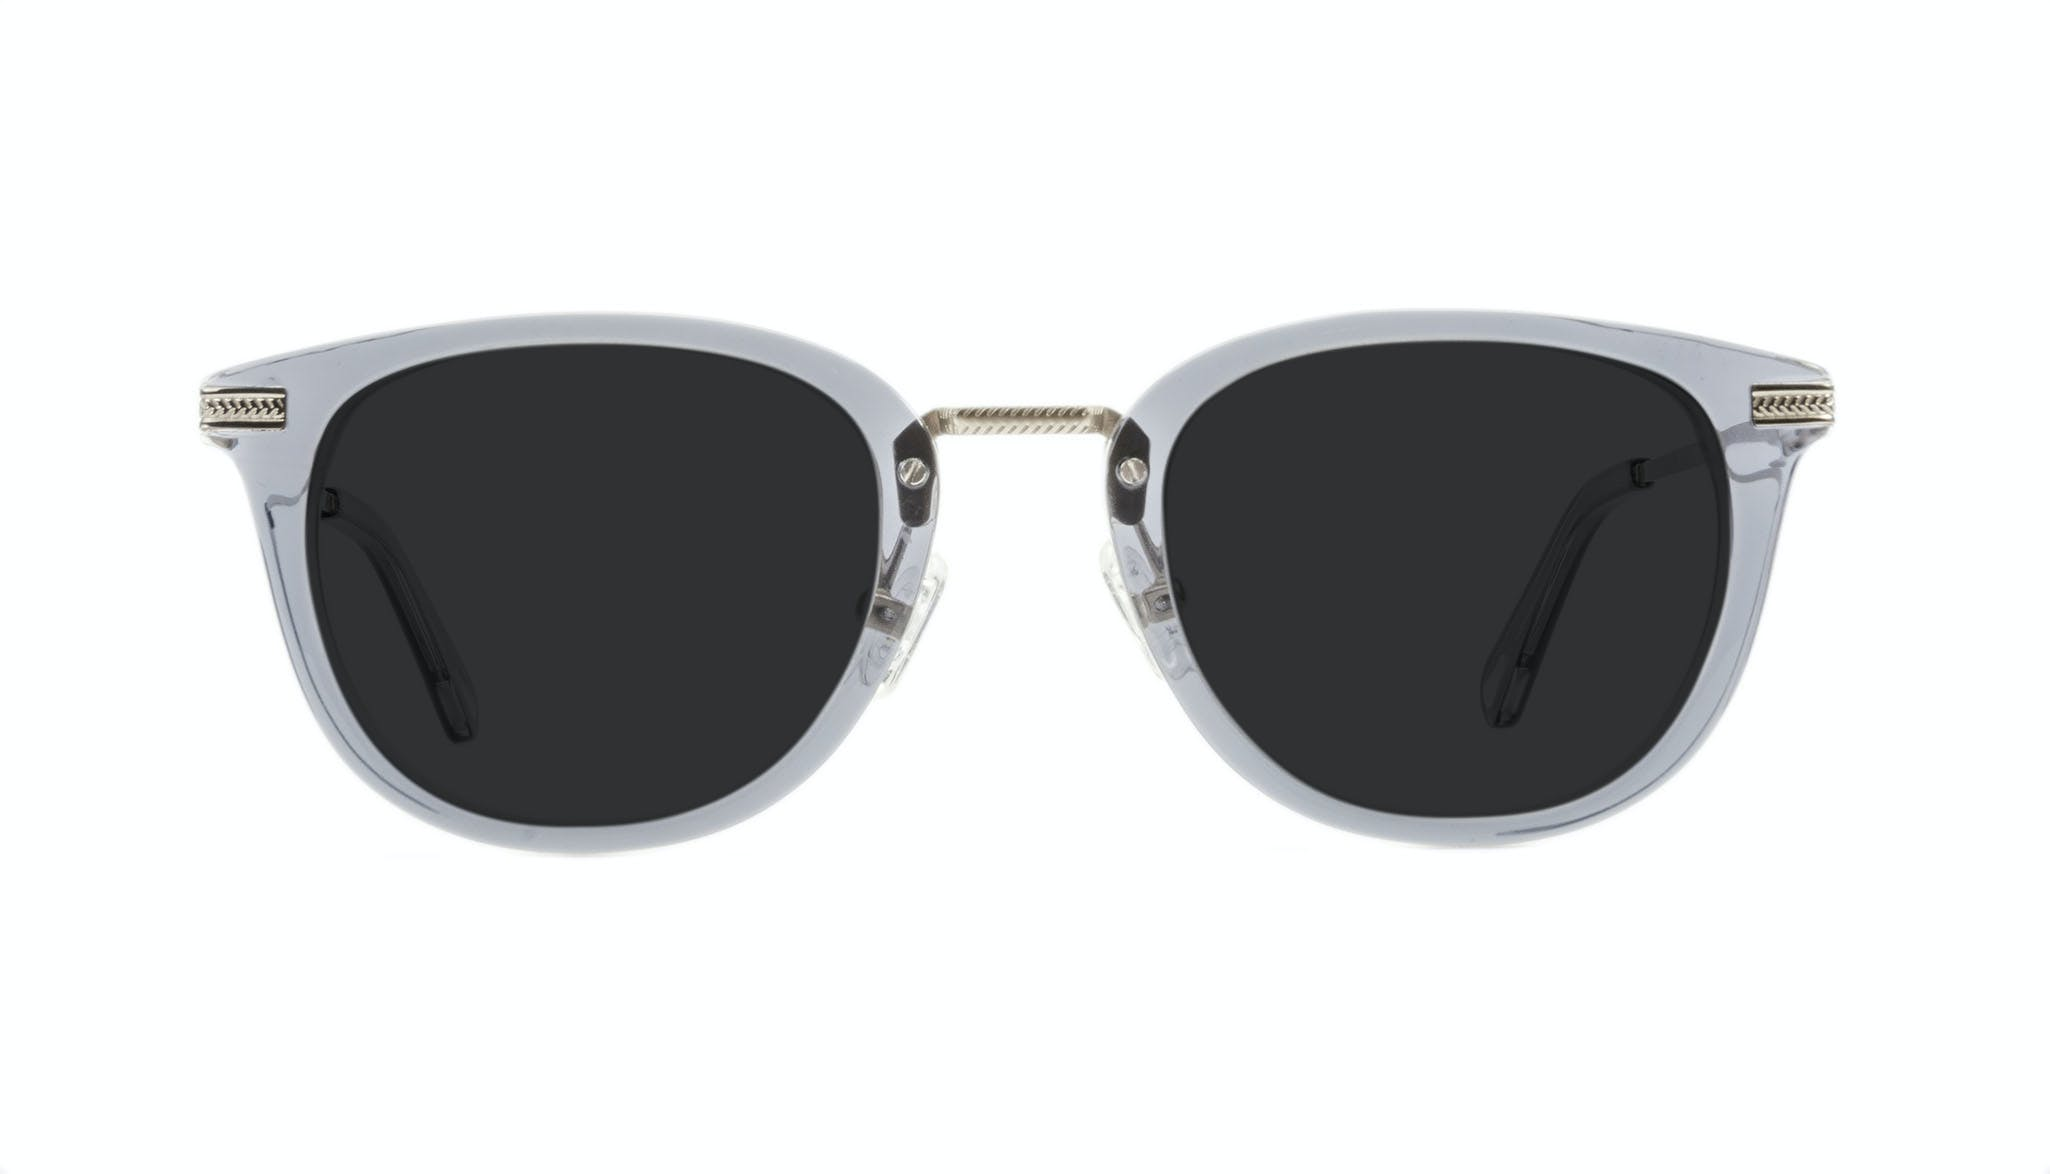 Affordable Fashion Glasses Rectangle Square Sunglasses Men Street Soul Ash Front